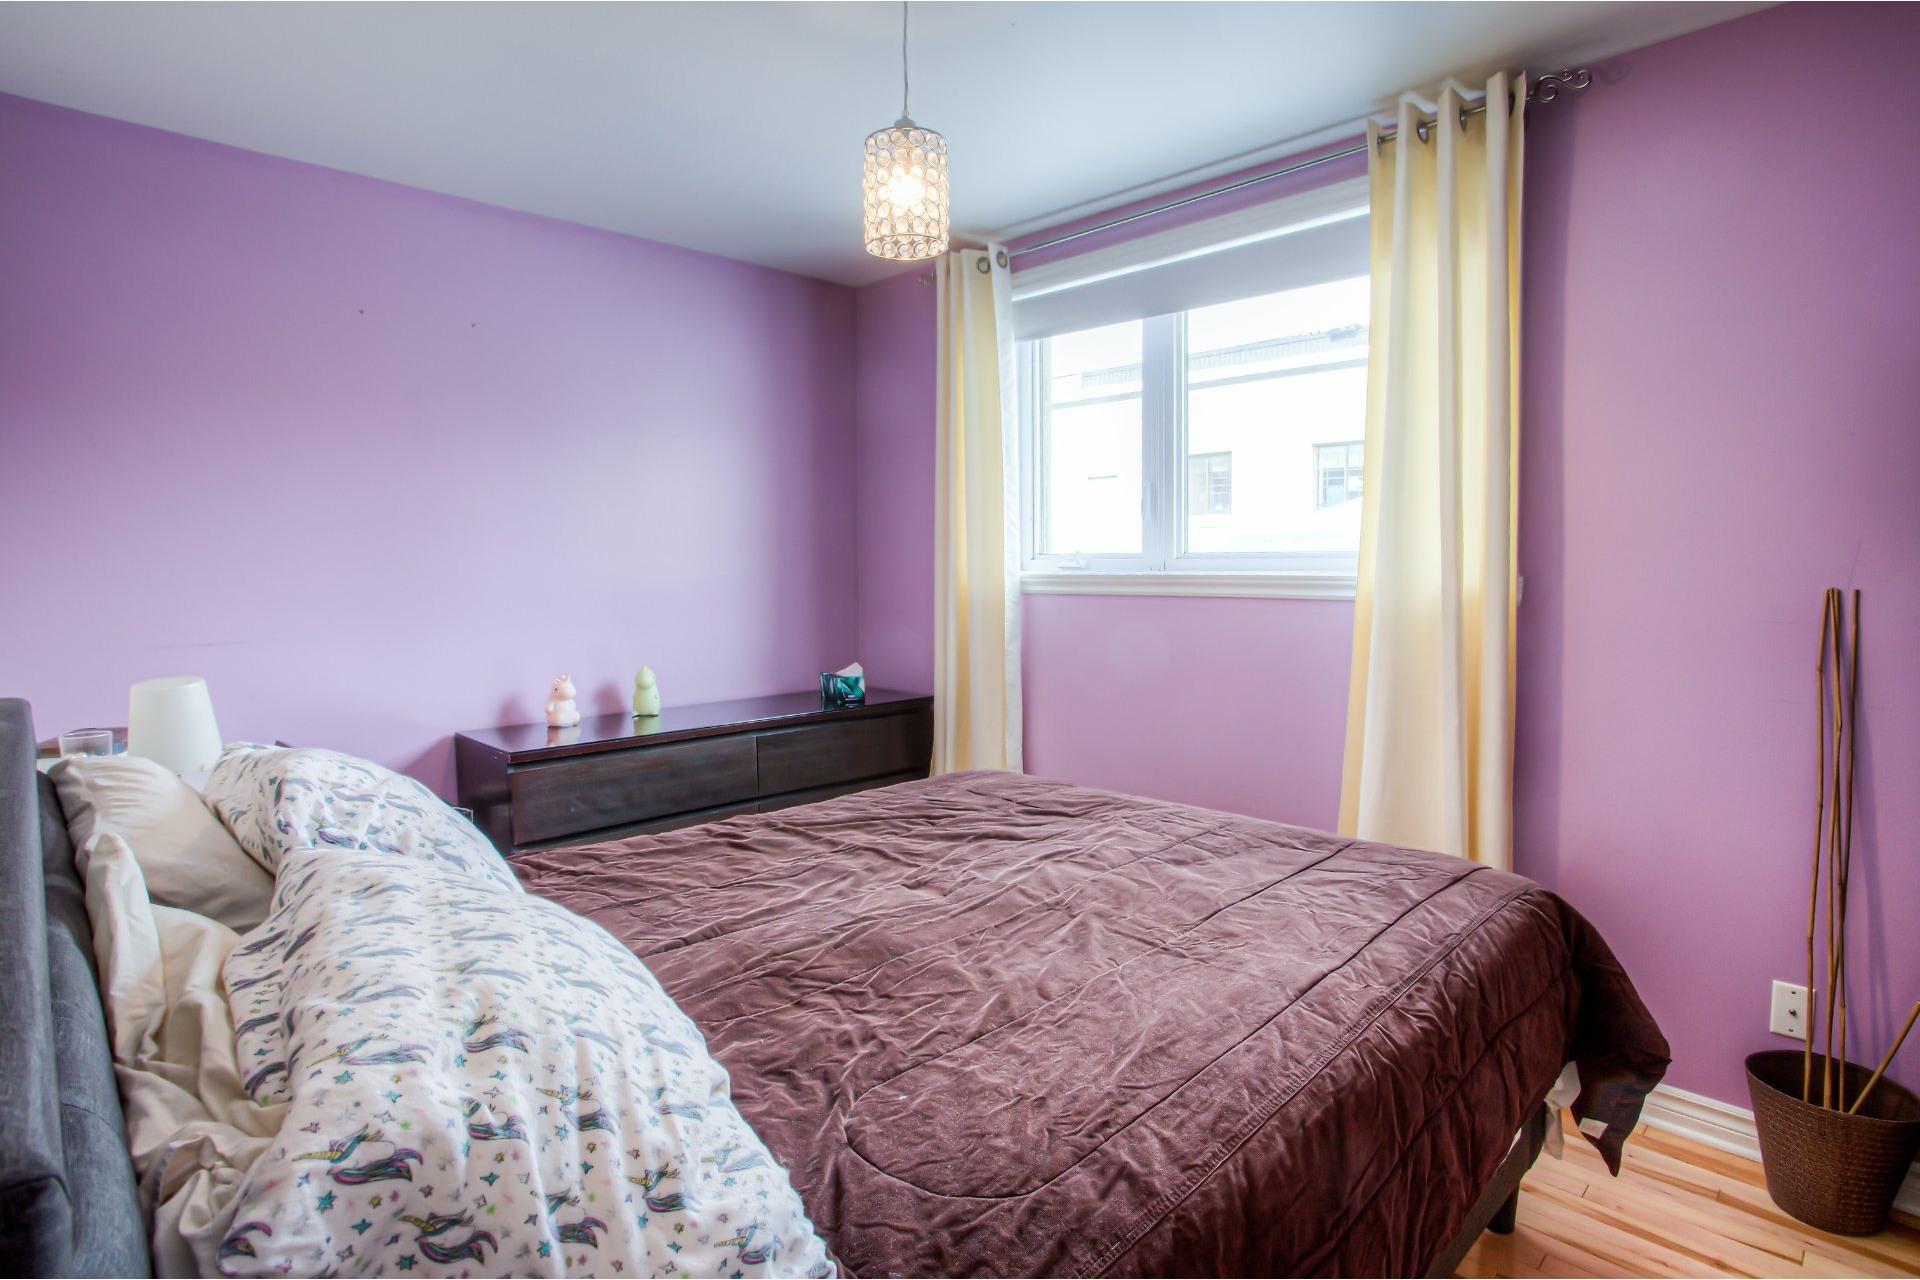 image 20 - Departamento Para alquiler Villeray/Saint-Michel/Parc-Extension Montréal  - 5 habitaciones